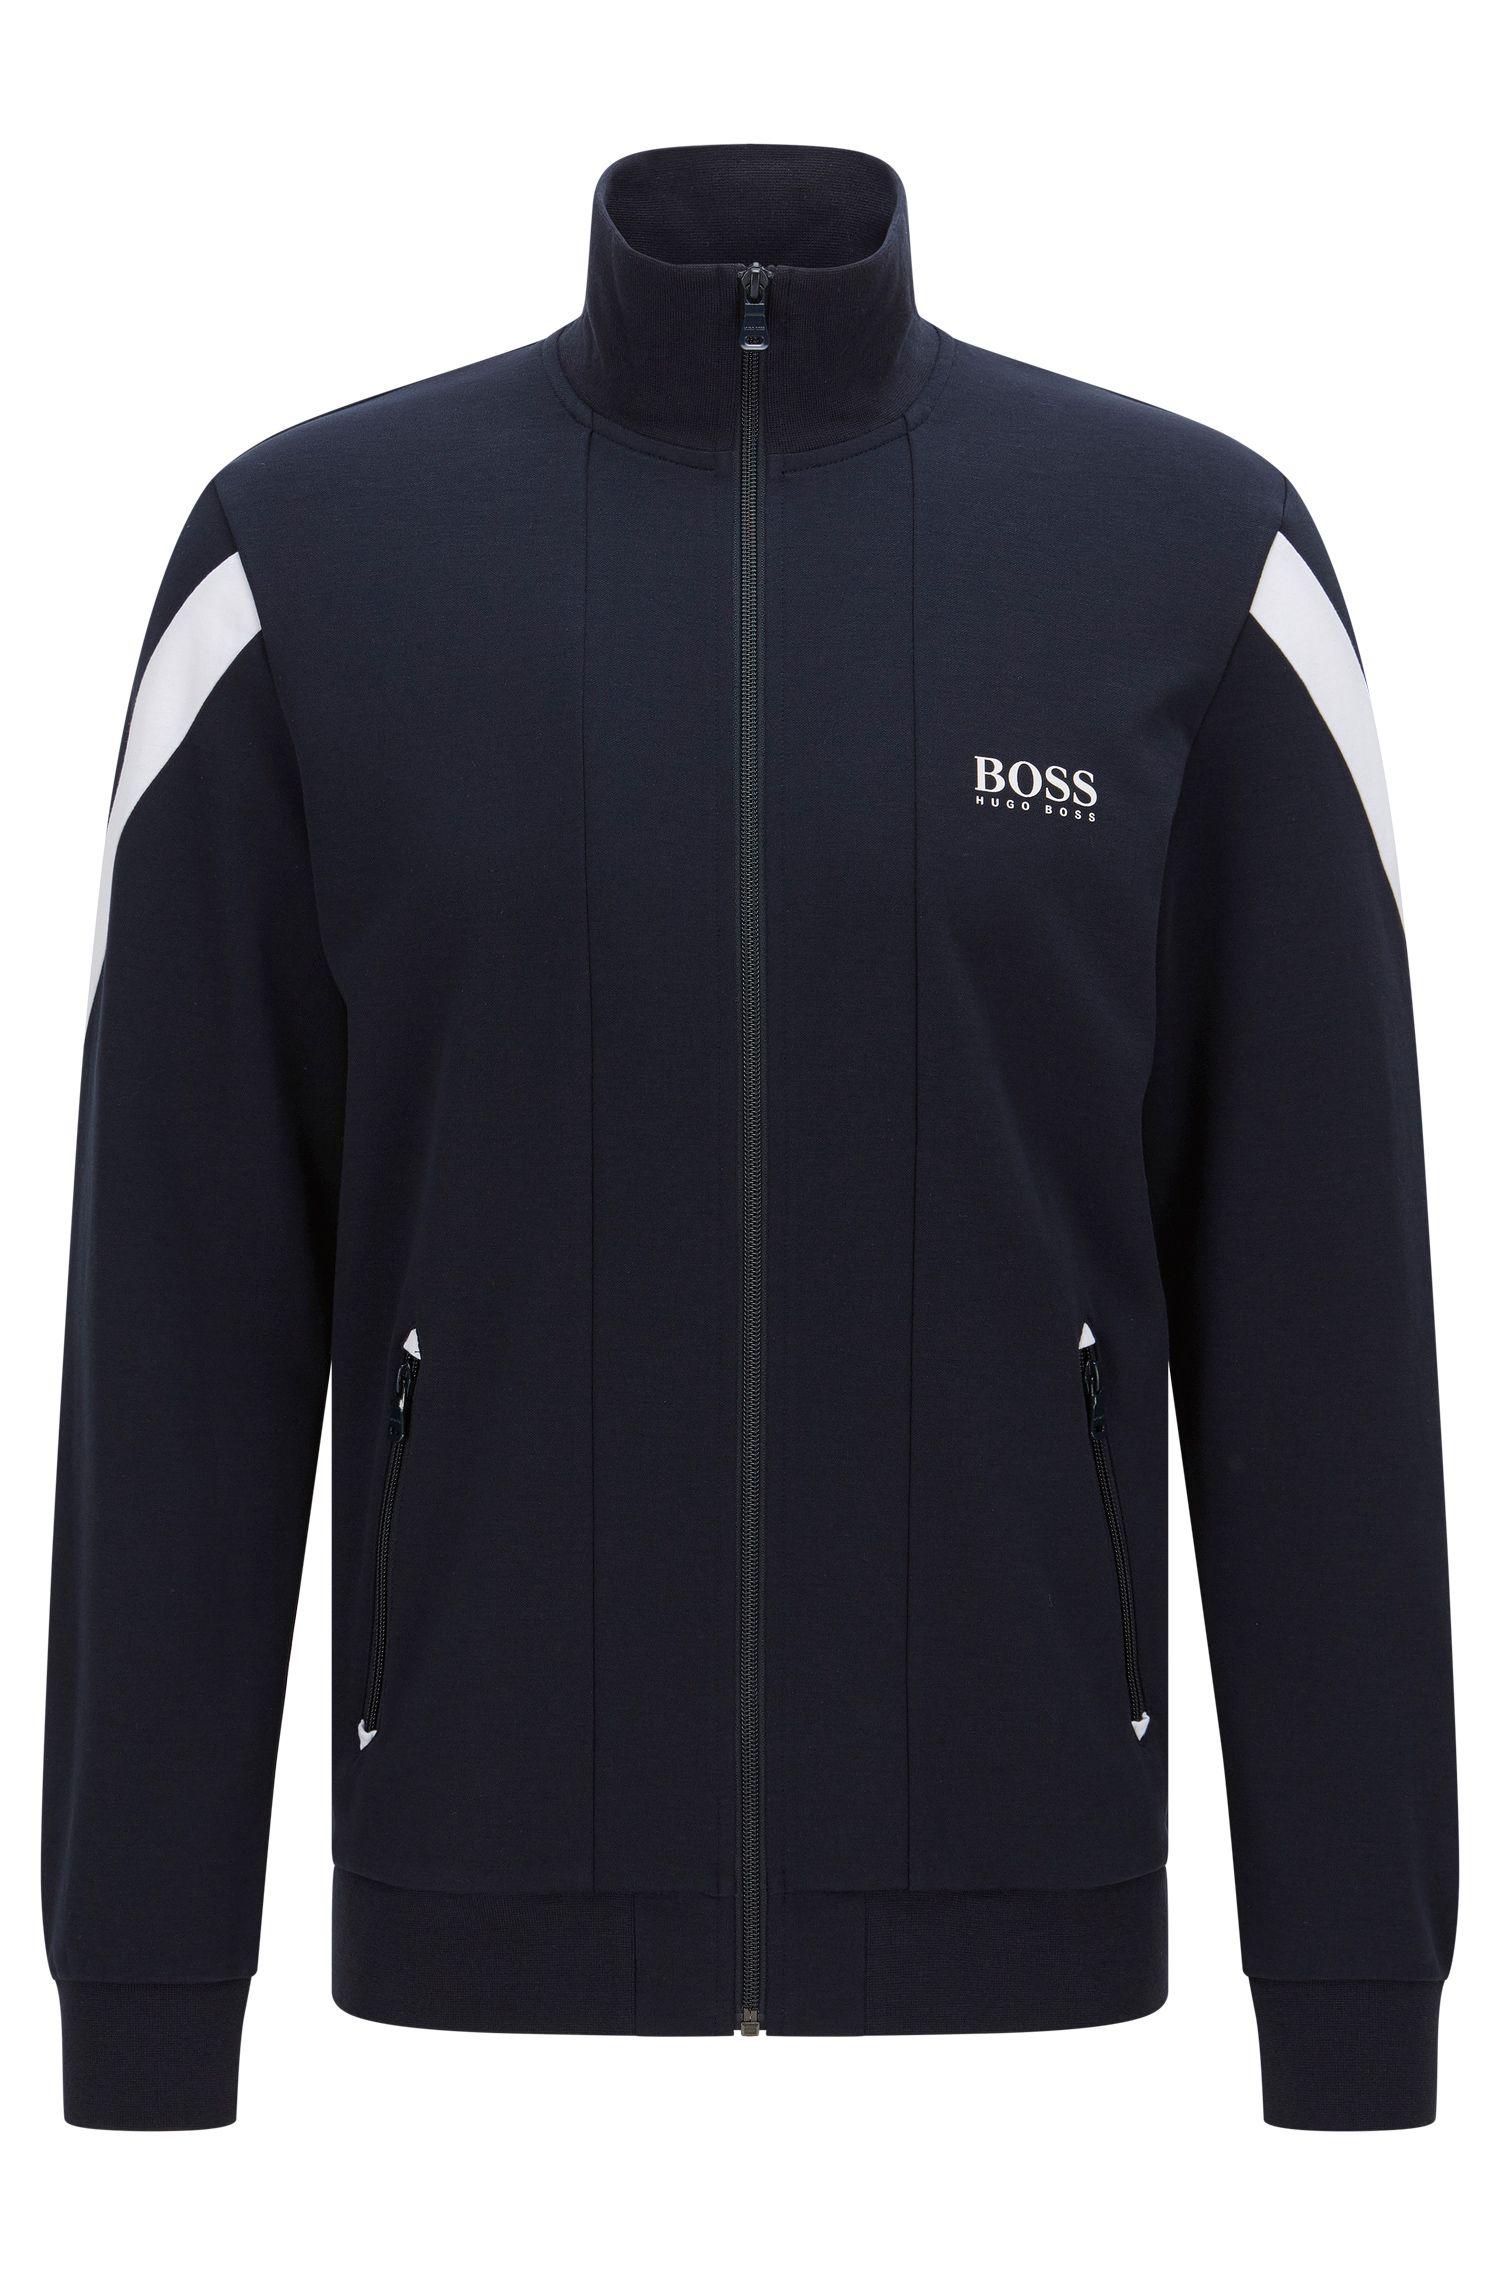 Stretch Cotton Zip Jersey Jacket | Jacket Zip